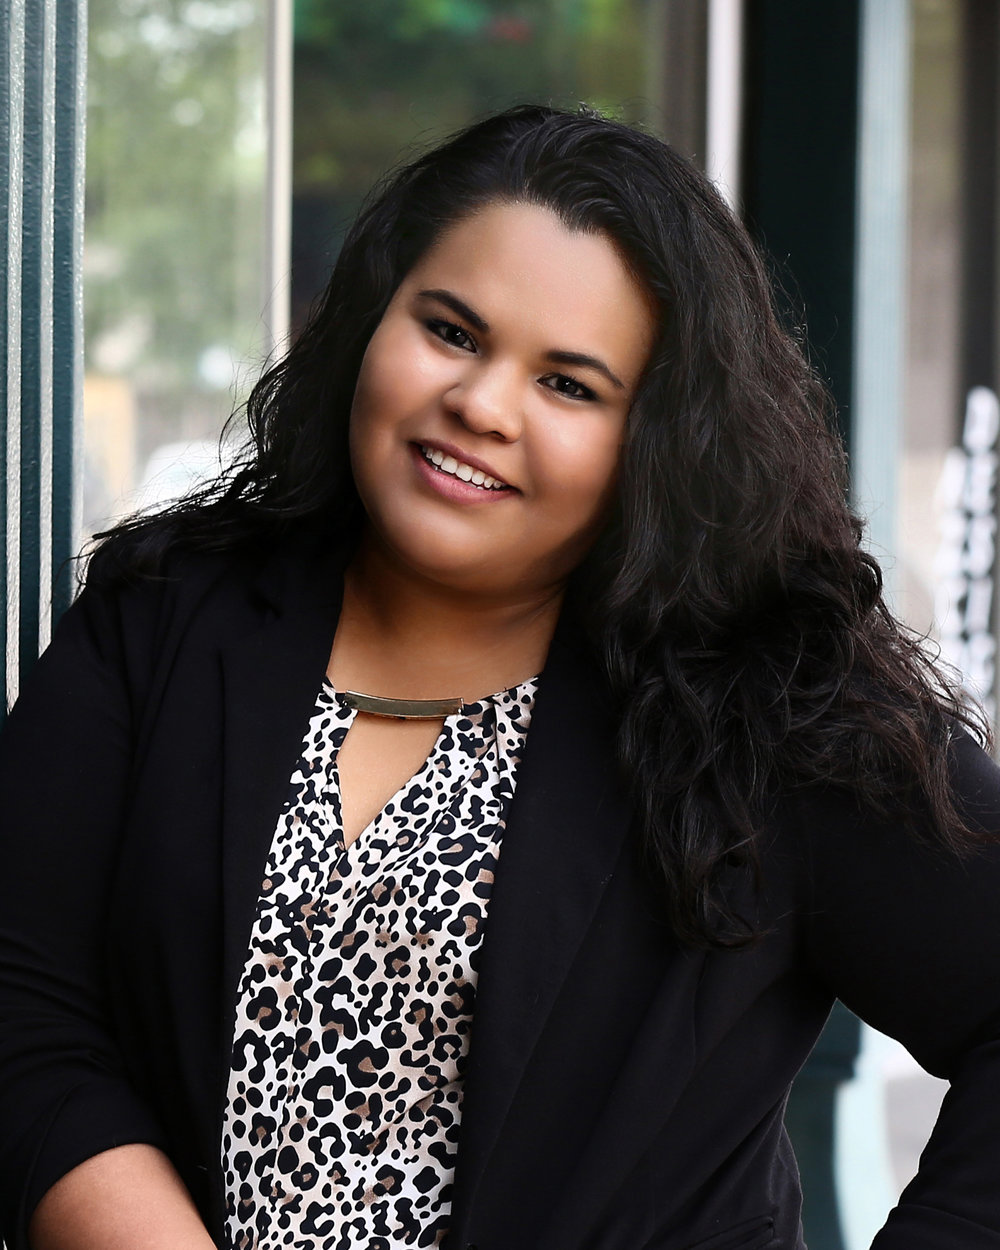 OFELIA HERNANDEZ Grand Island Recruiter